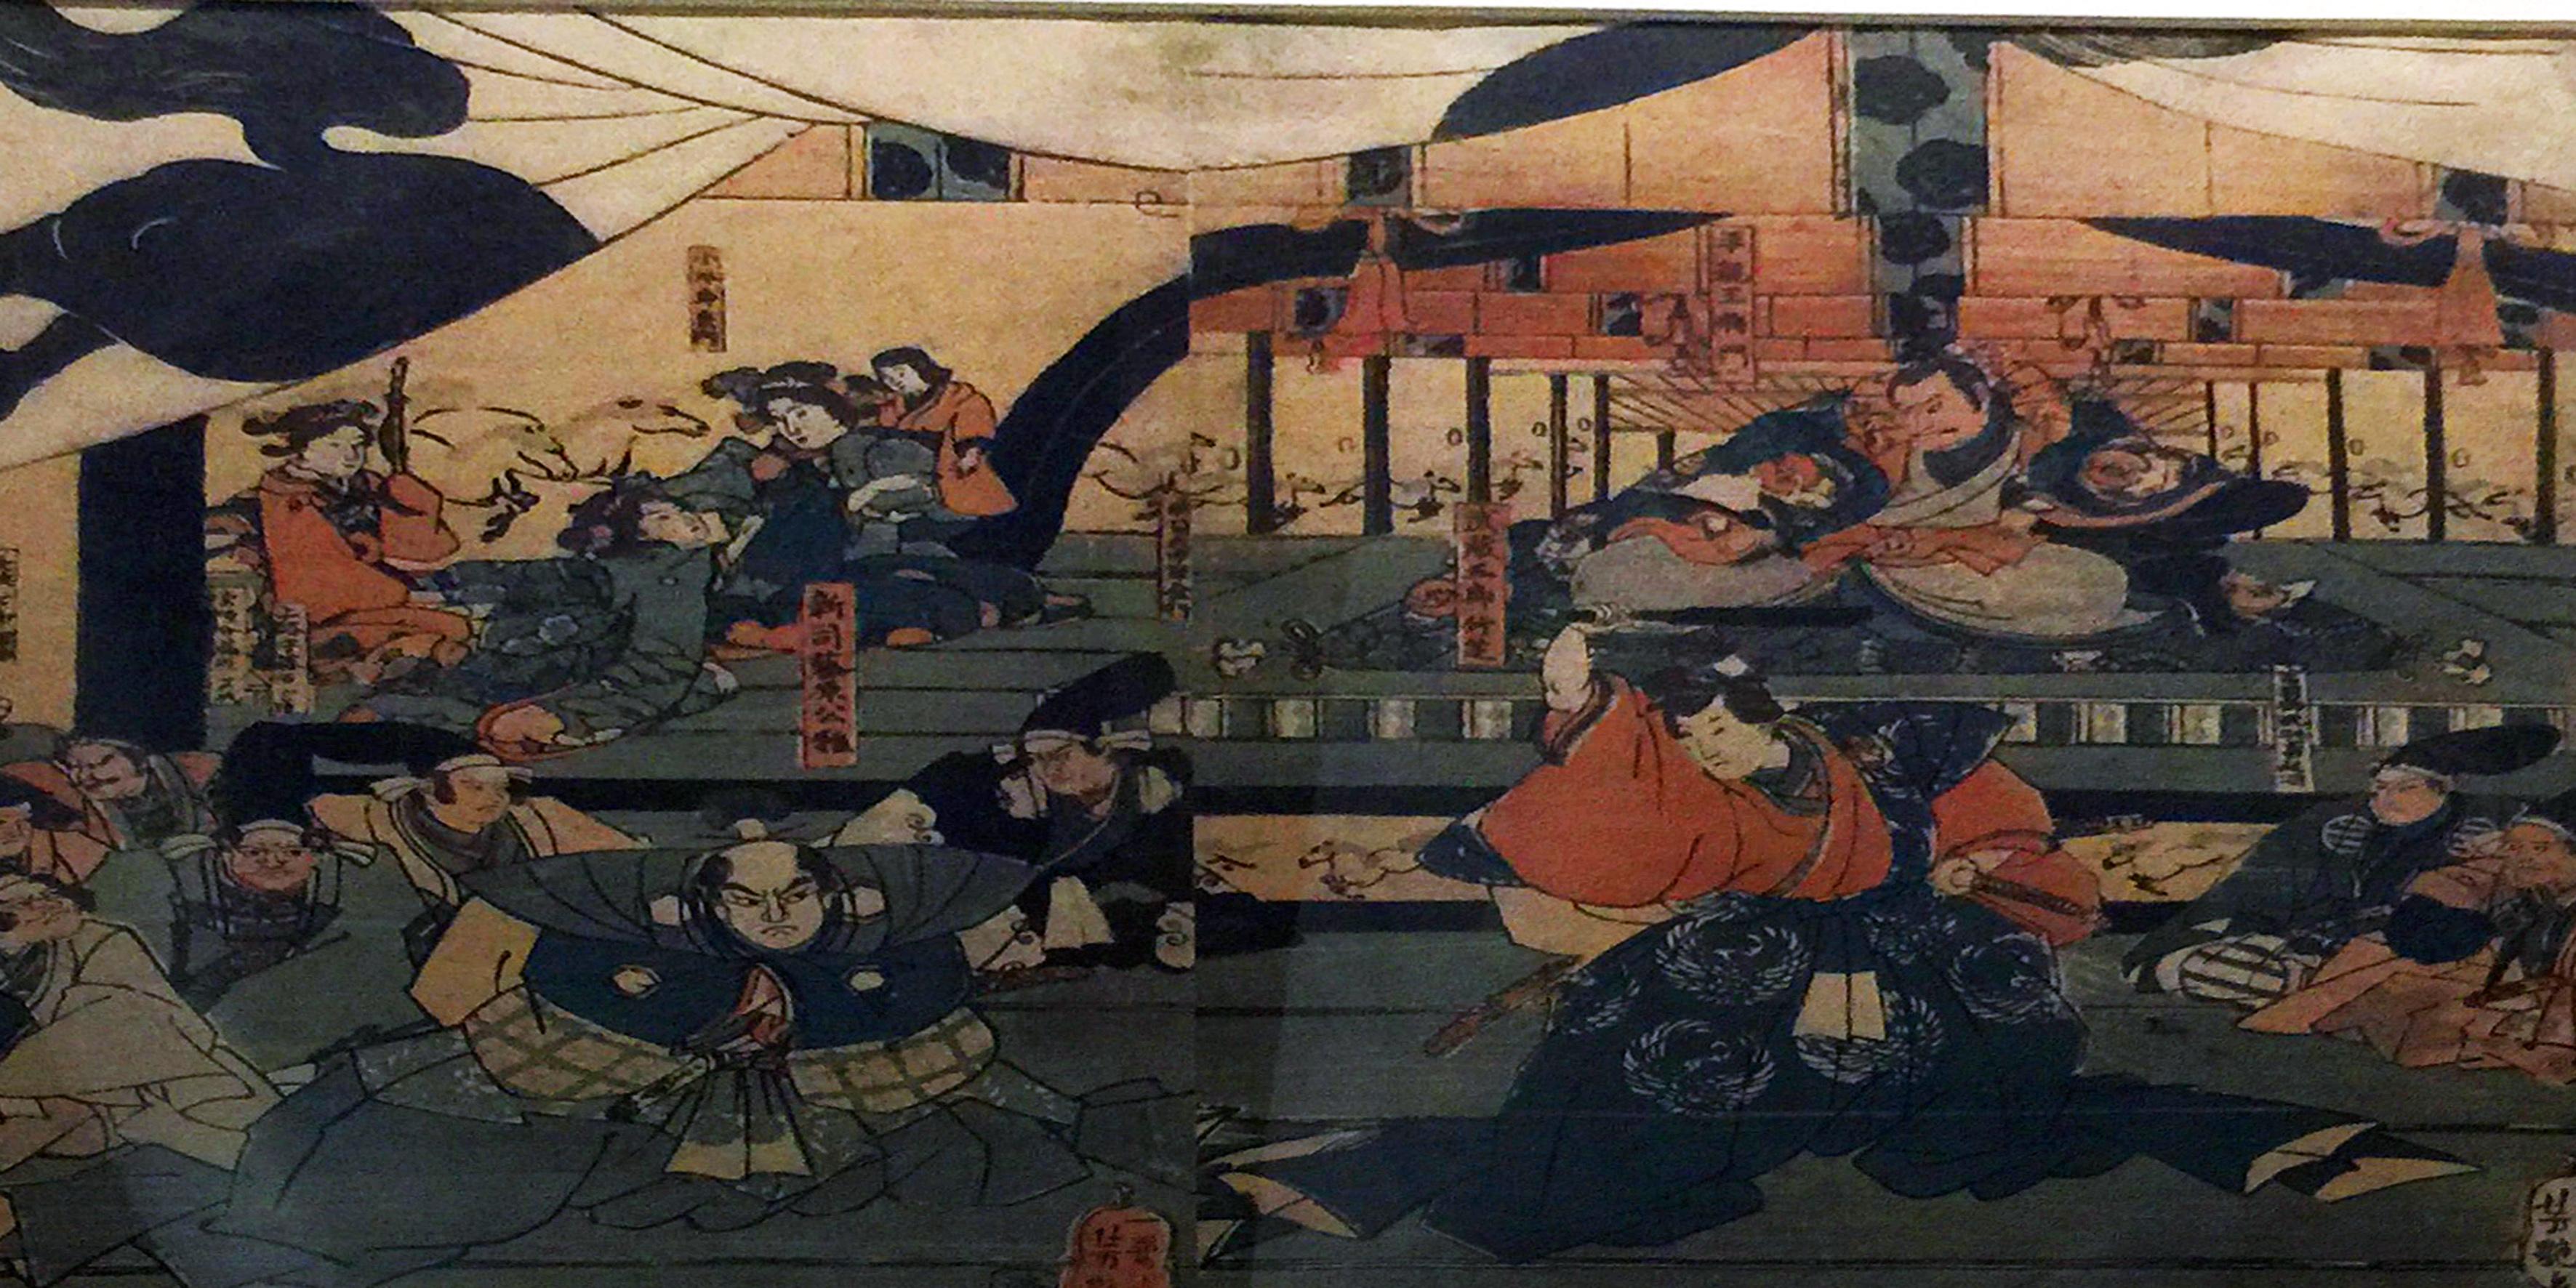 Scena teatrale-1850-Xilografia policroma su carta di gelso-Koku-Yoshitsuya-Arte giapponese